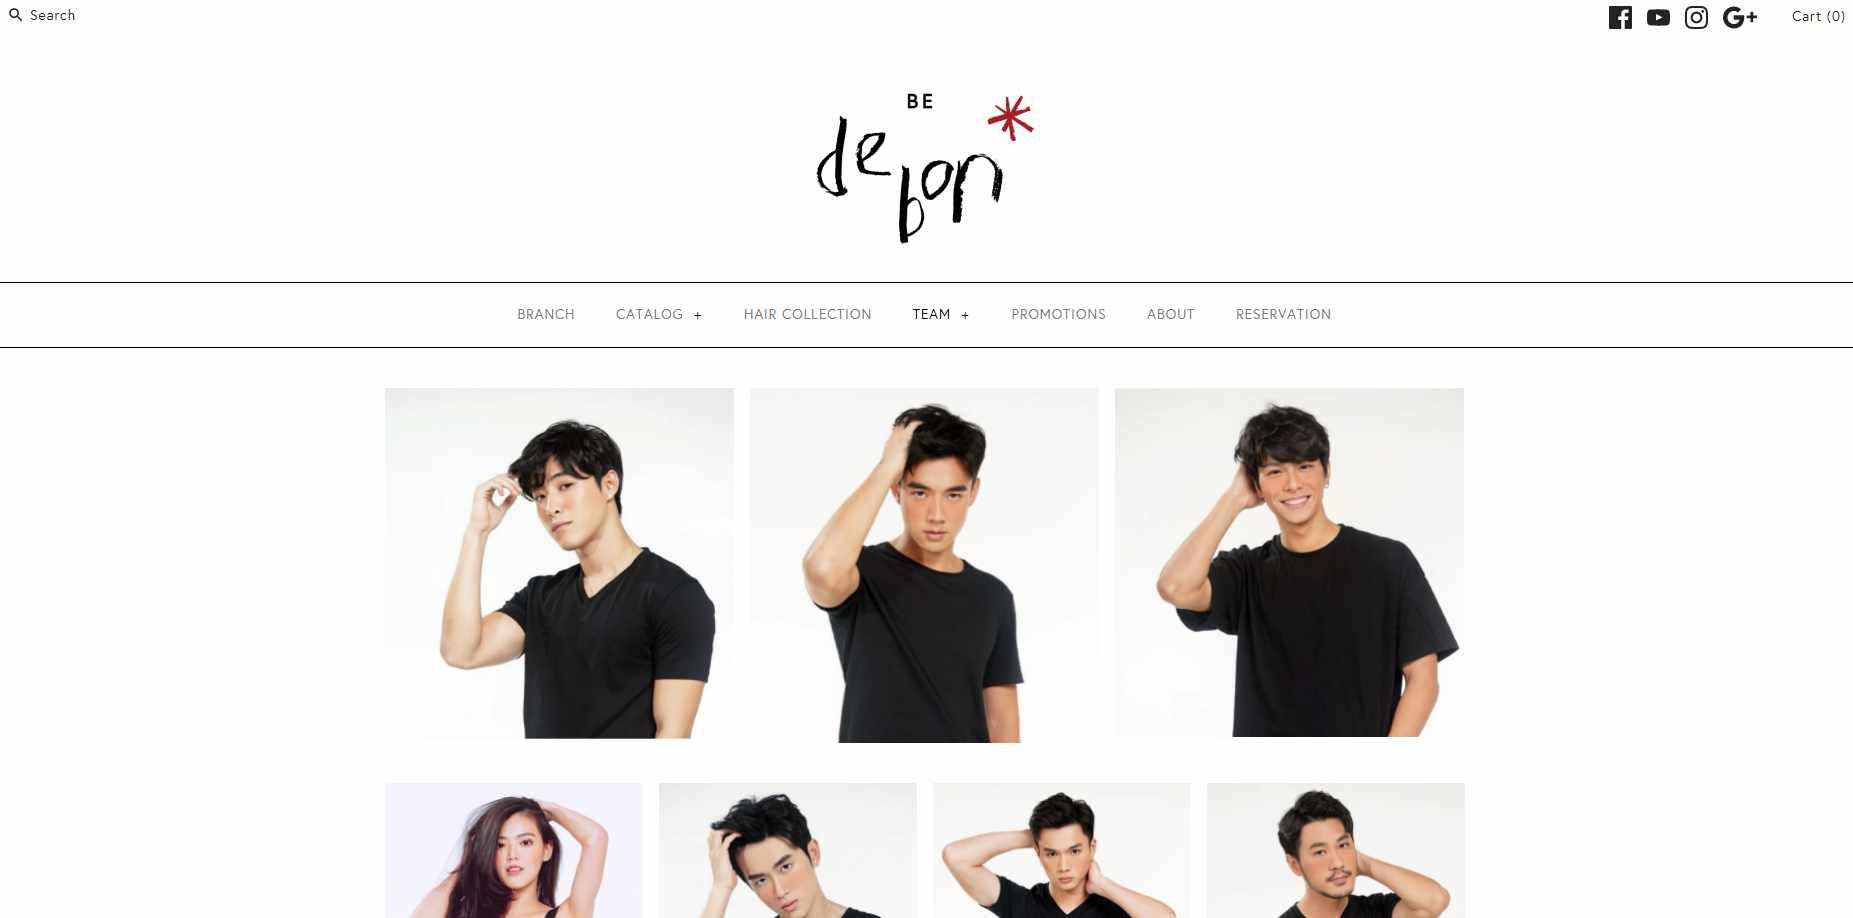 bedebon Top Korean Hair Salons in Singapore